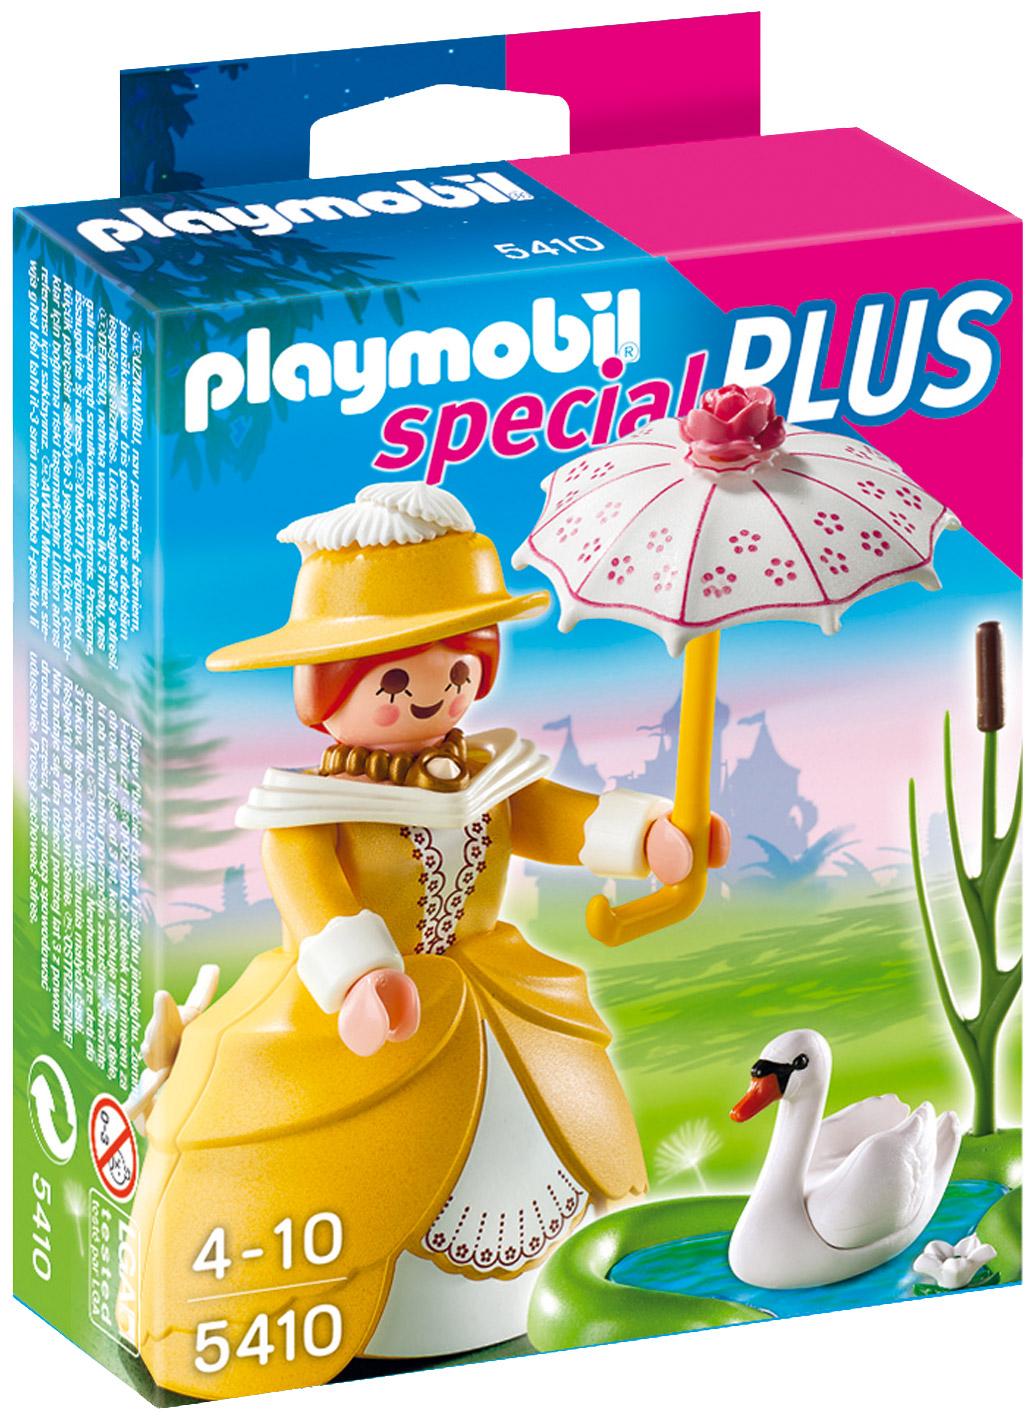 playmobil special plus 5410 pas cher